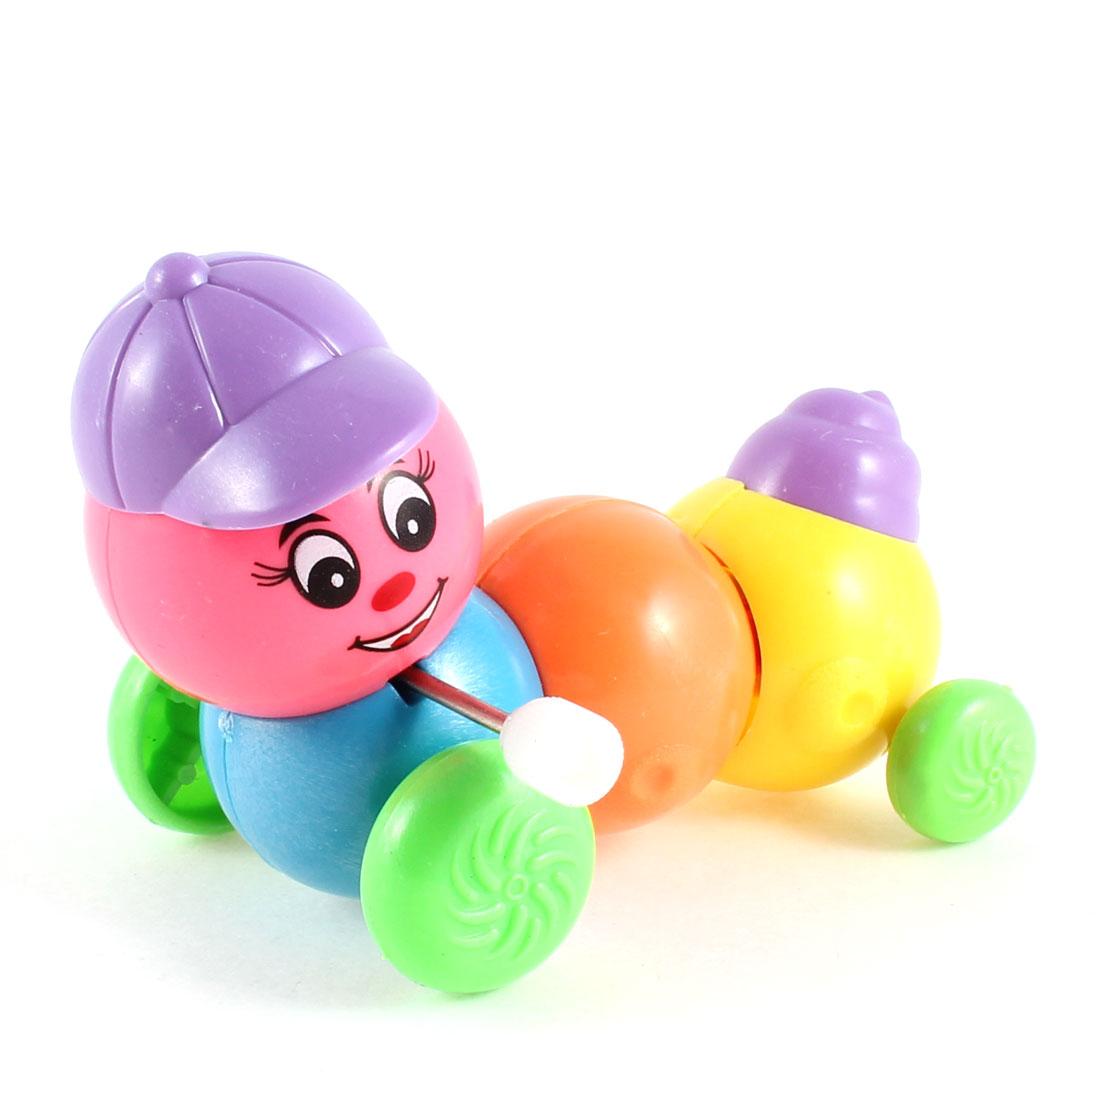 Plastic 4 Sections Wind up Clockwork Cartoon Carpenterworm Toy for Kids